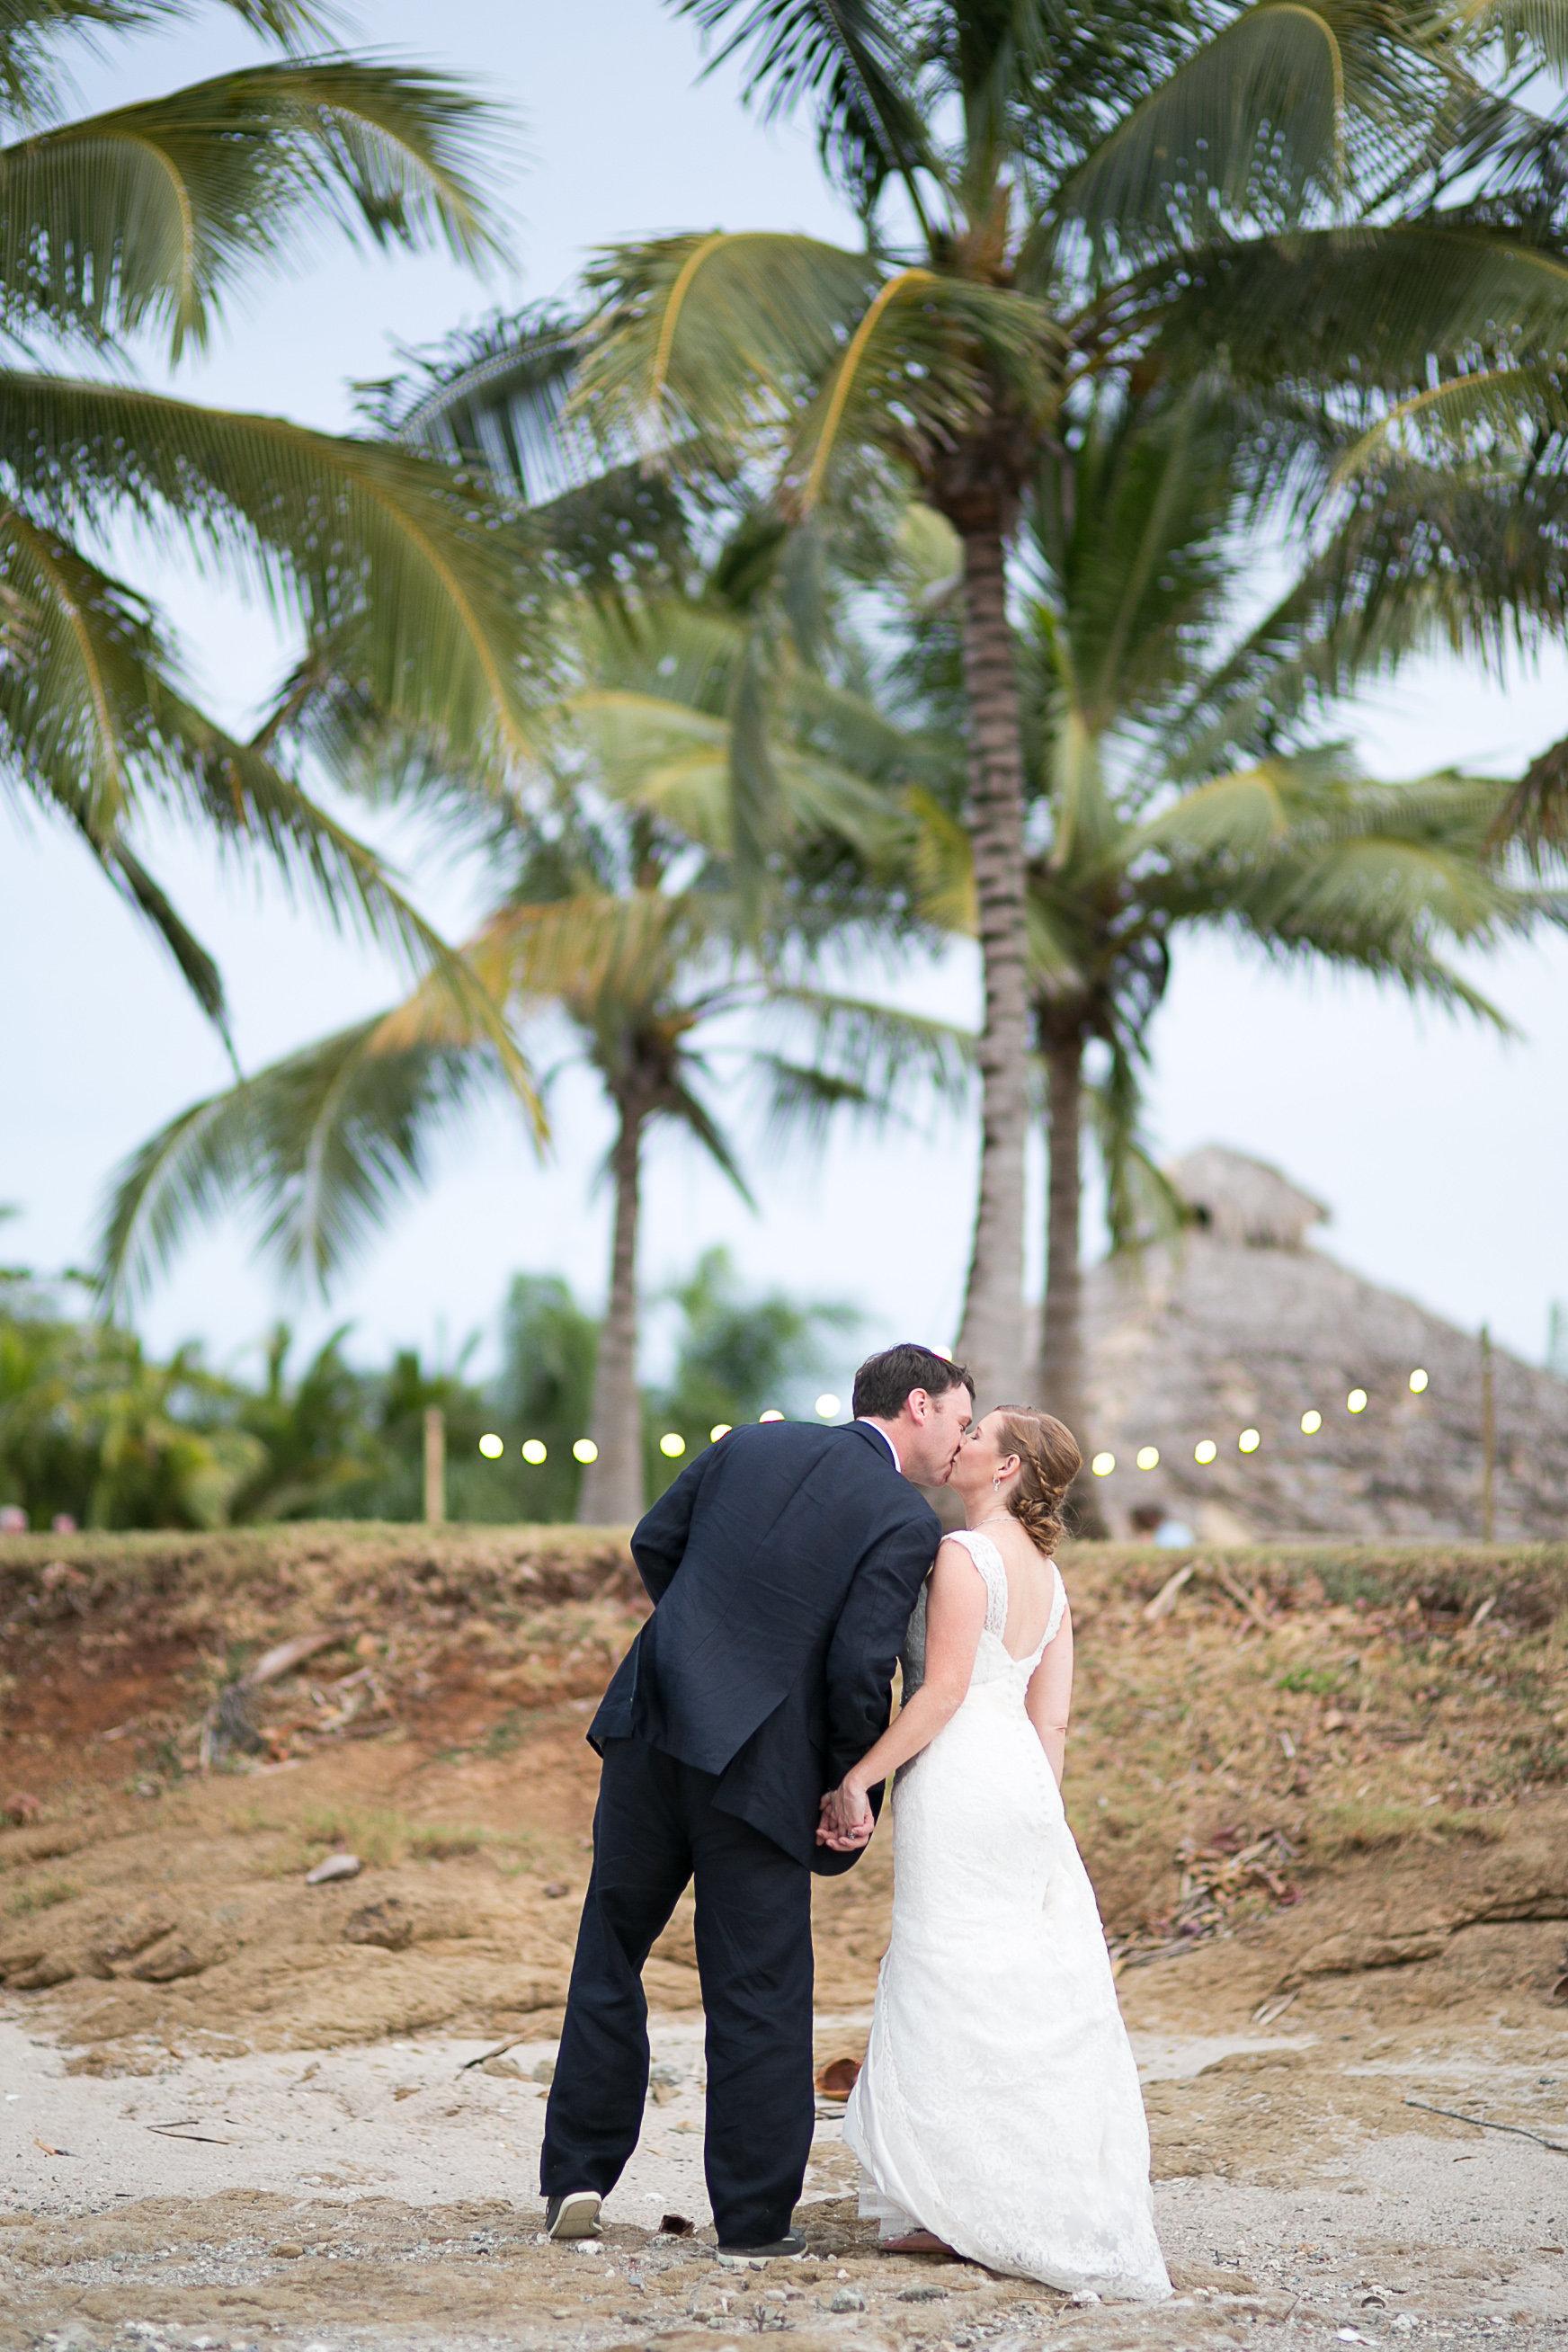 tropical wedding – Page 2 – Weddings Costa Rica